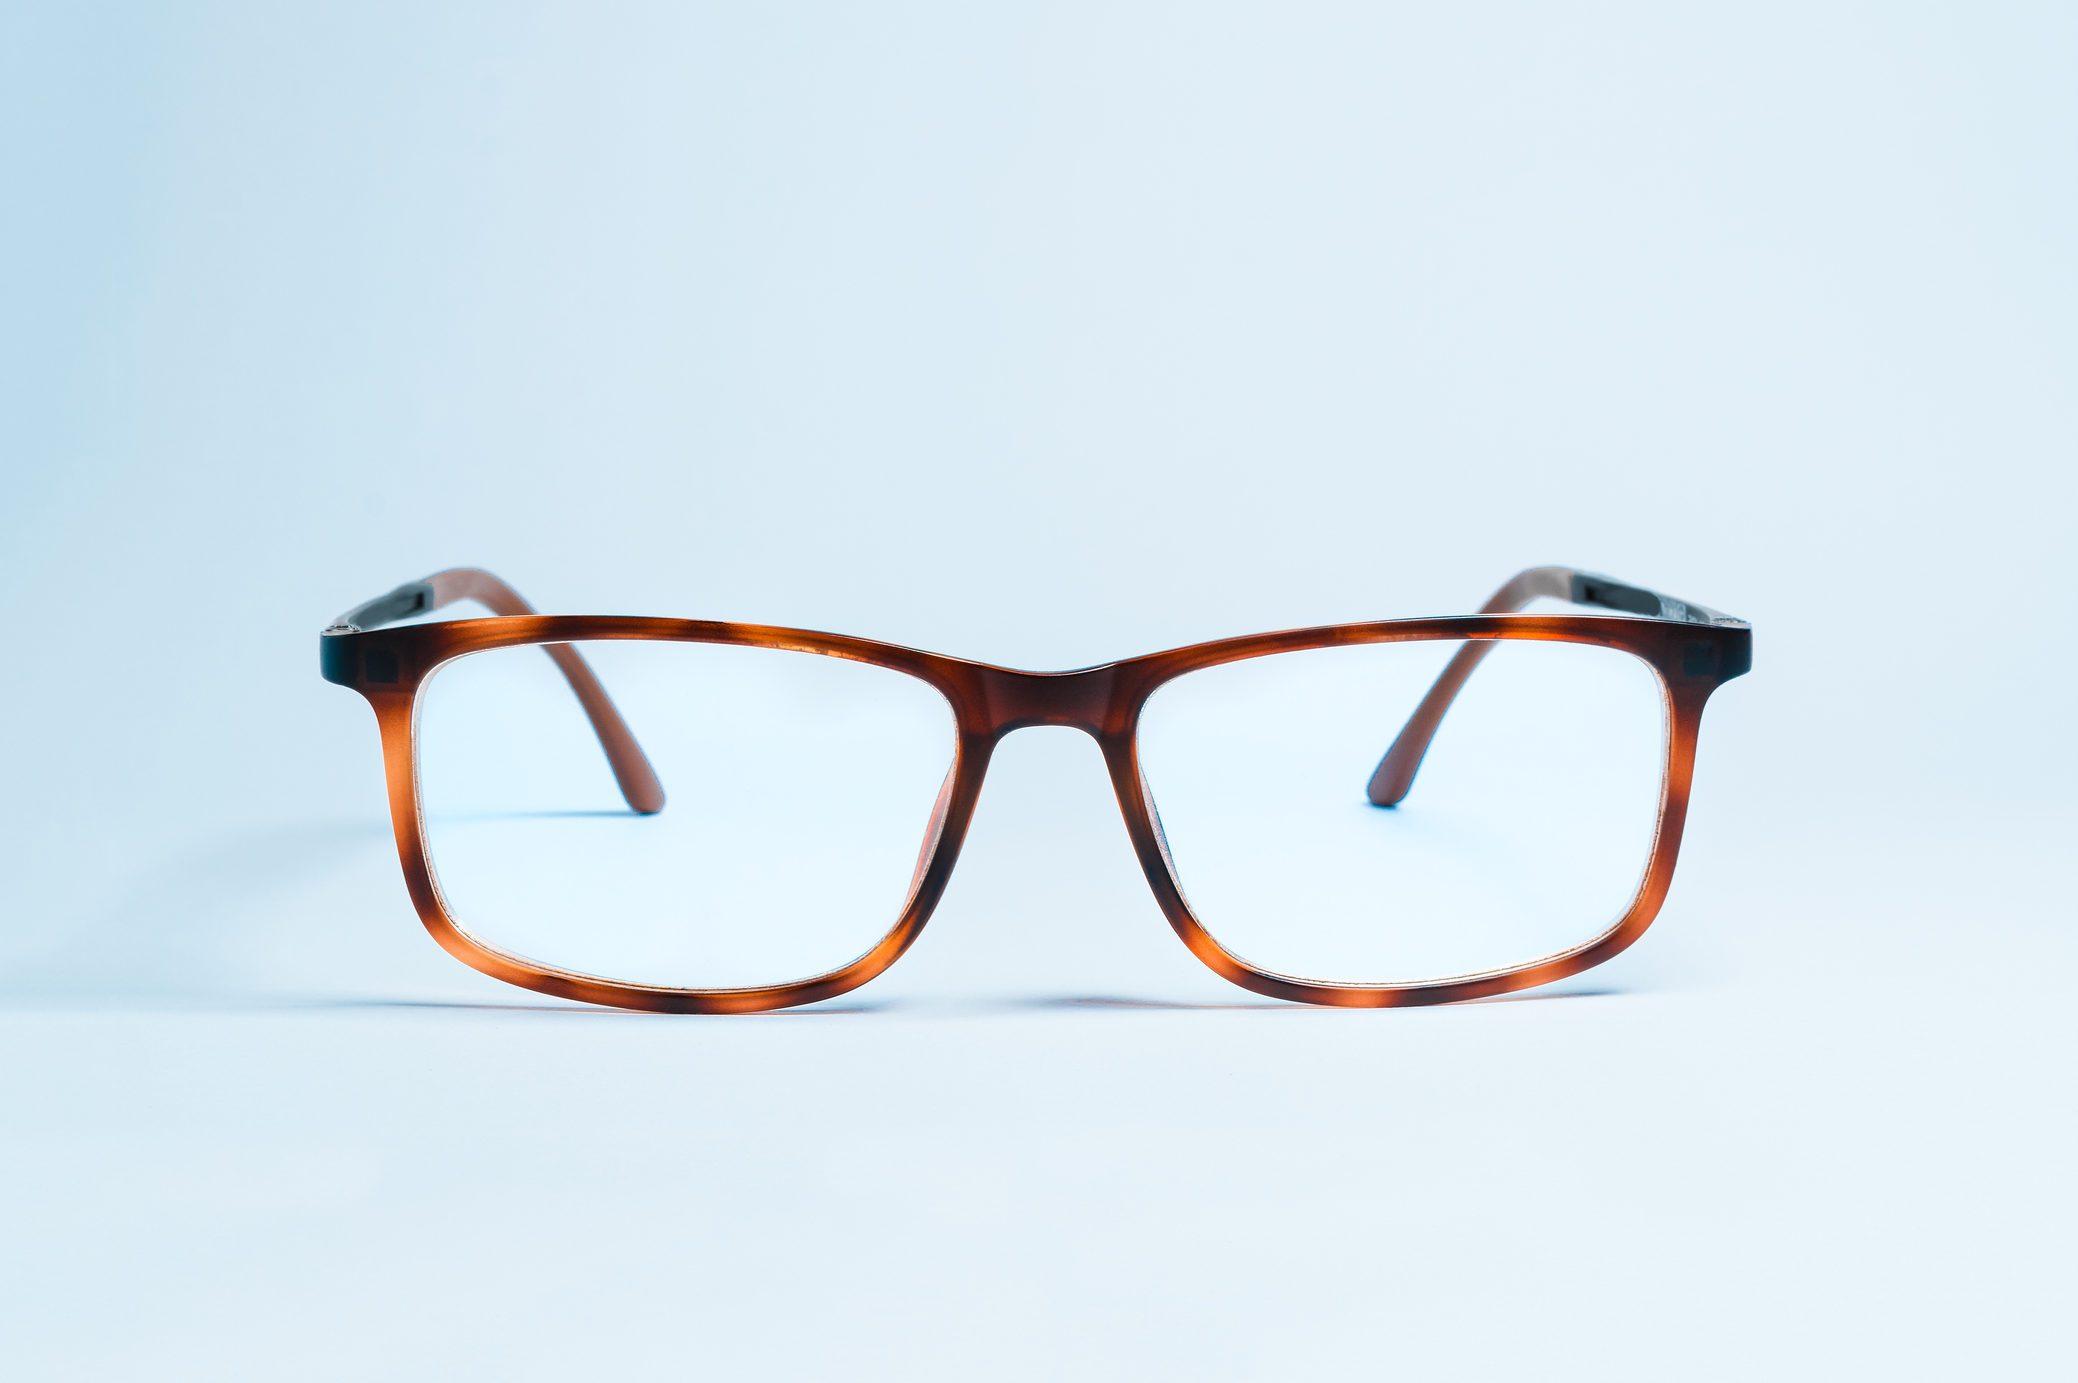 Close-Up Of Eyeglasses Against Blue Background